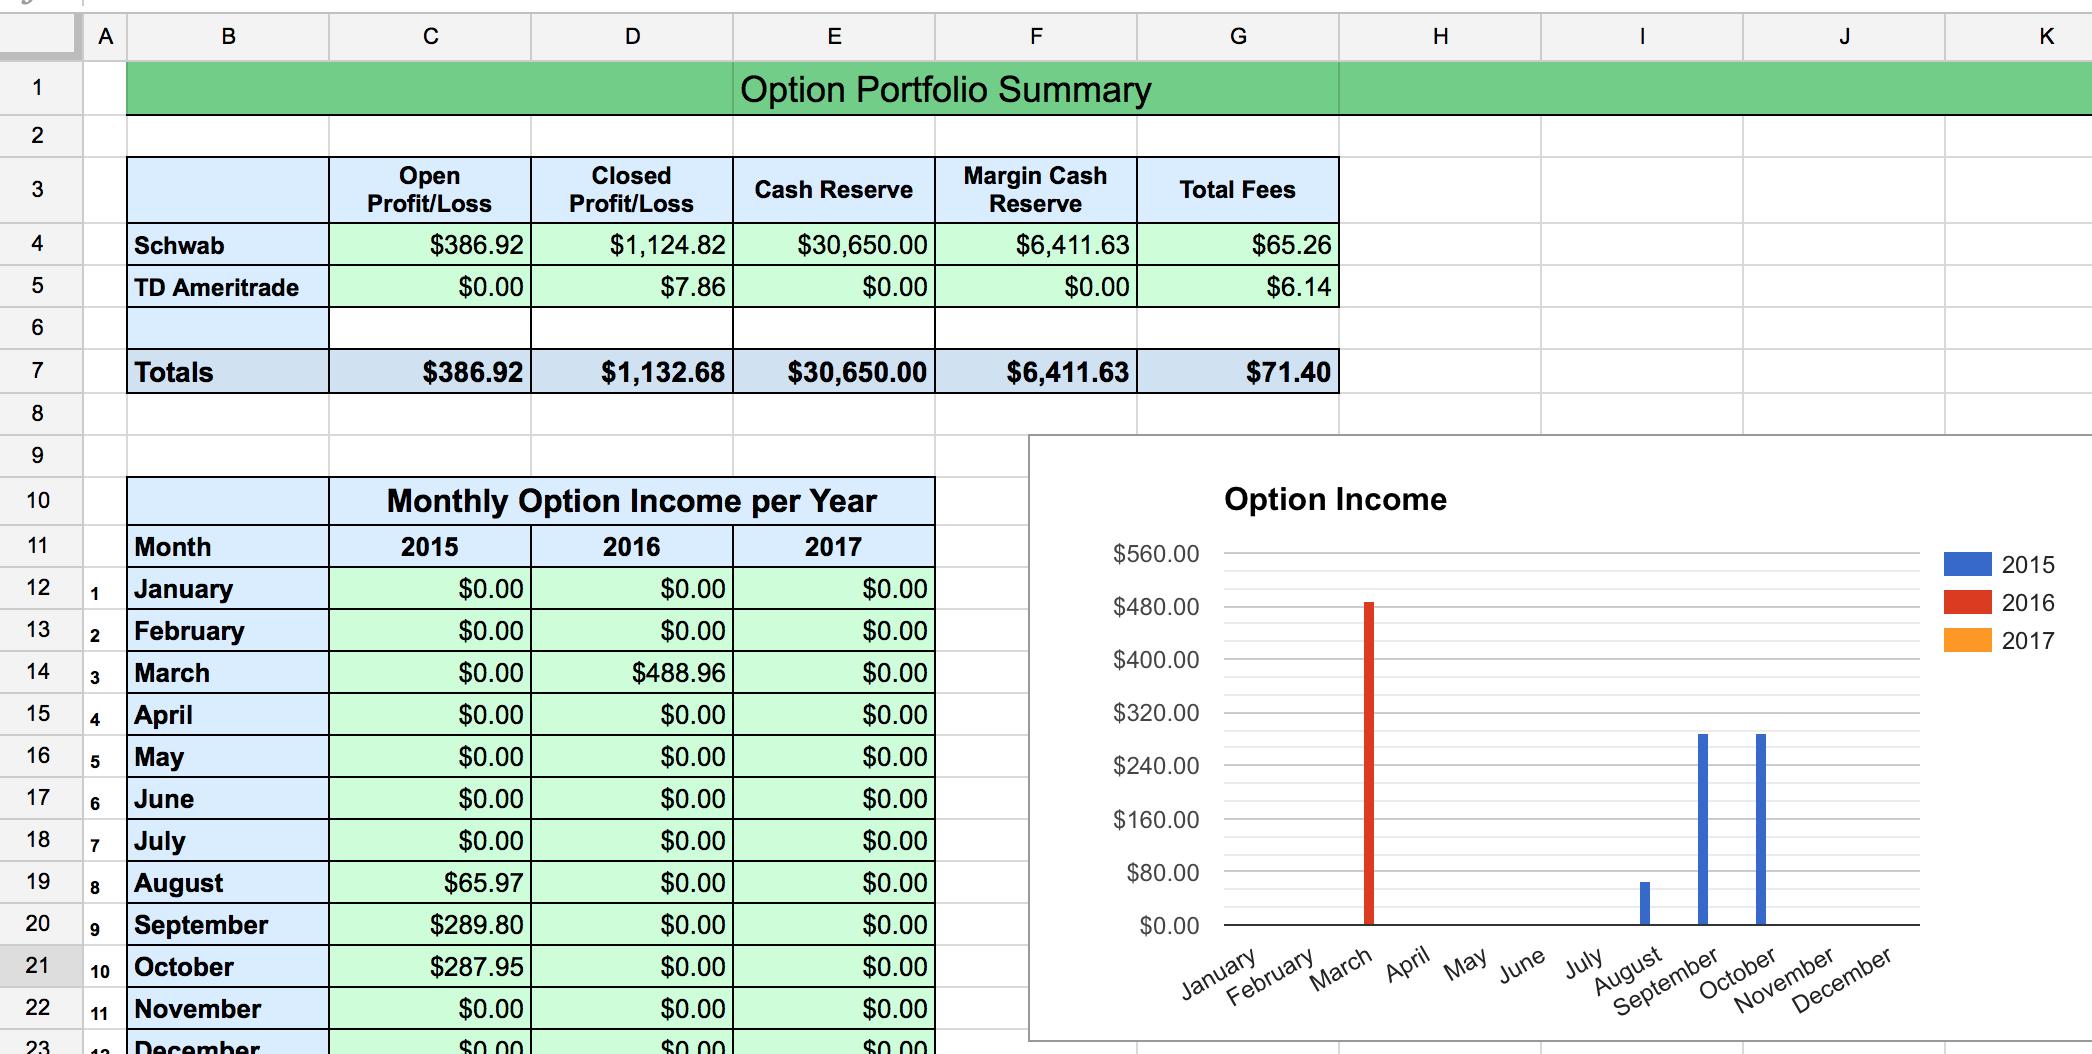 Annualised Hours Spreadsheet Inside Options Tracker Spreadsheet – Two Investing Annualised Hours Spreadsheet Printable Spreadshee Printable Spreadshee annualised hours spreadsheet